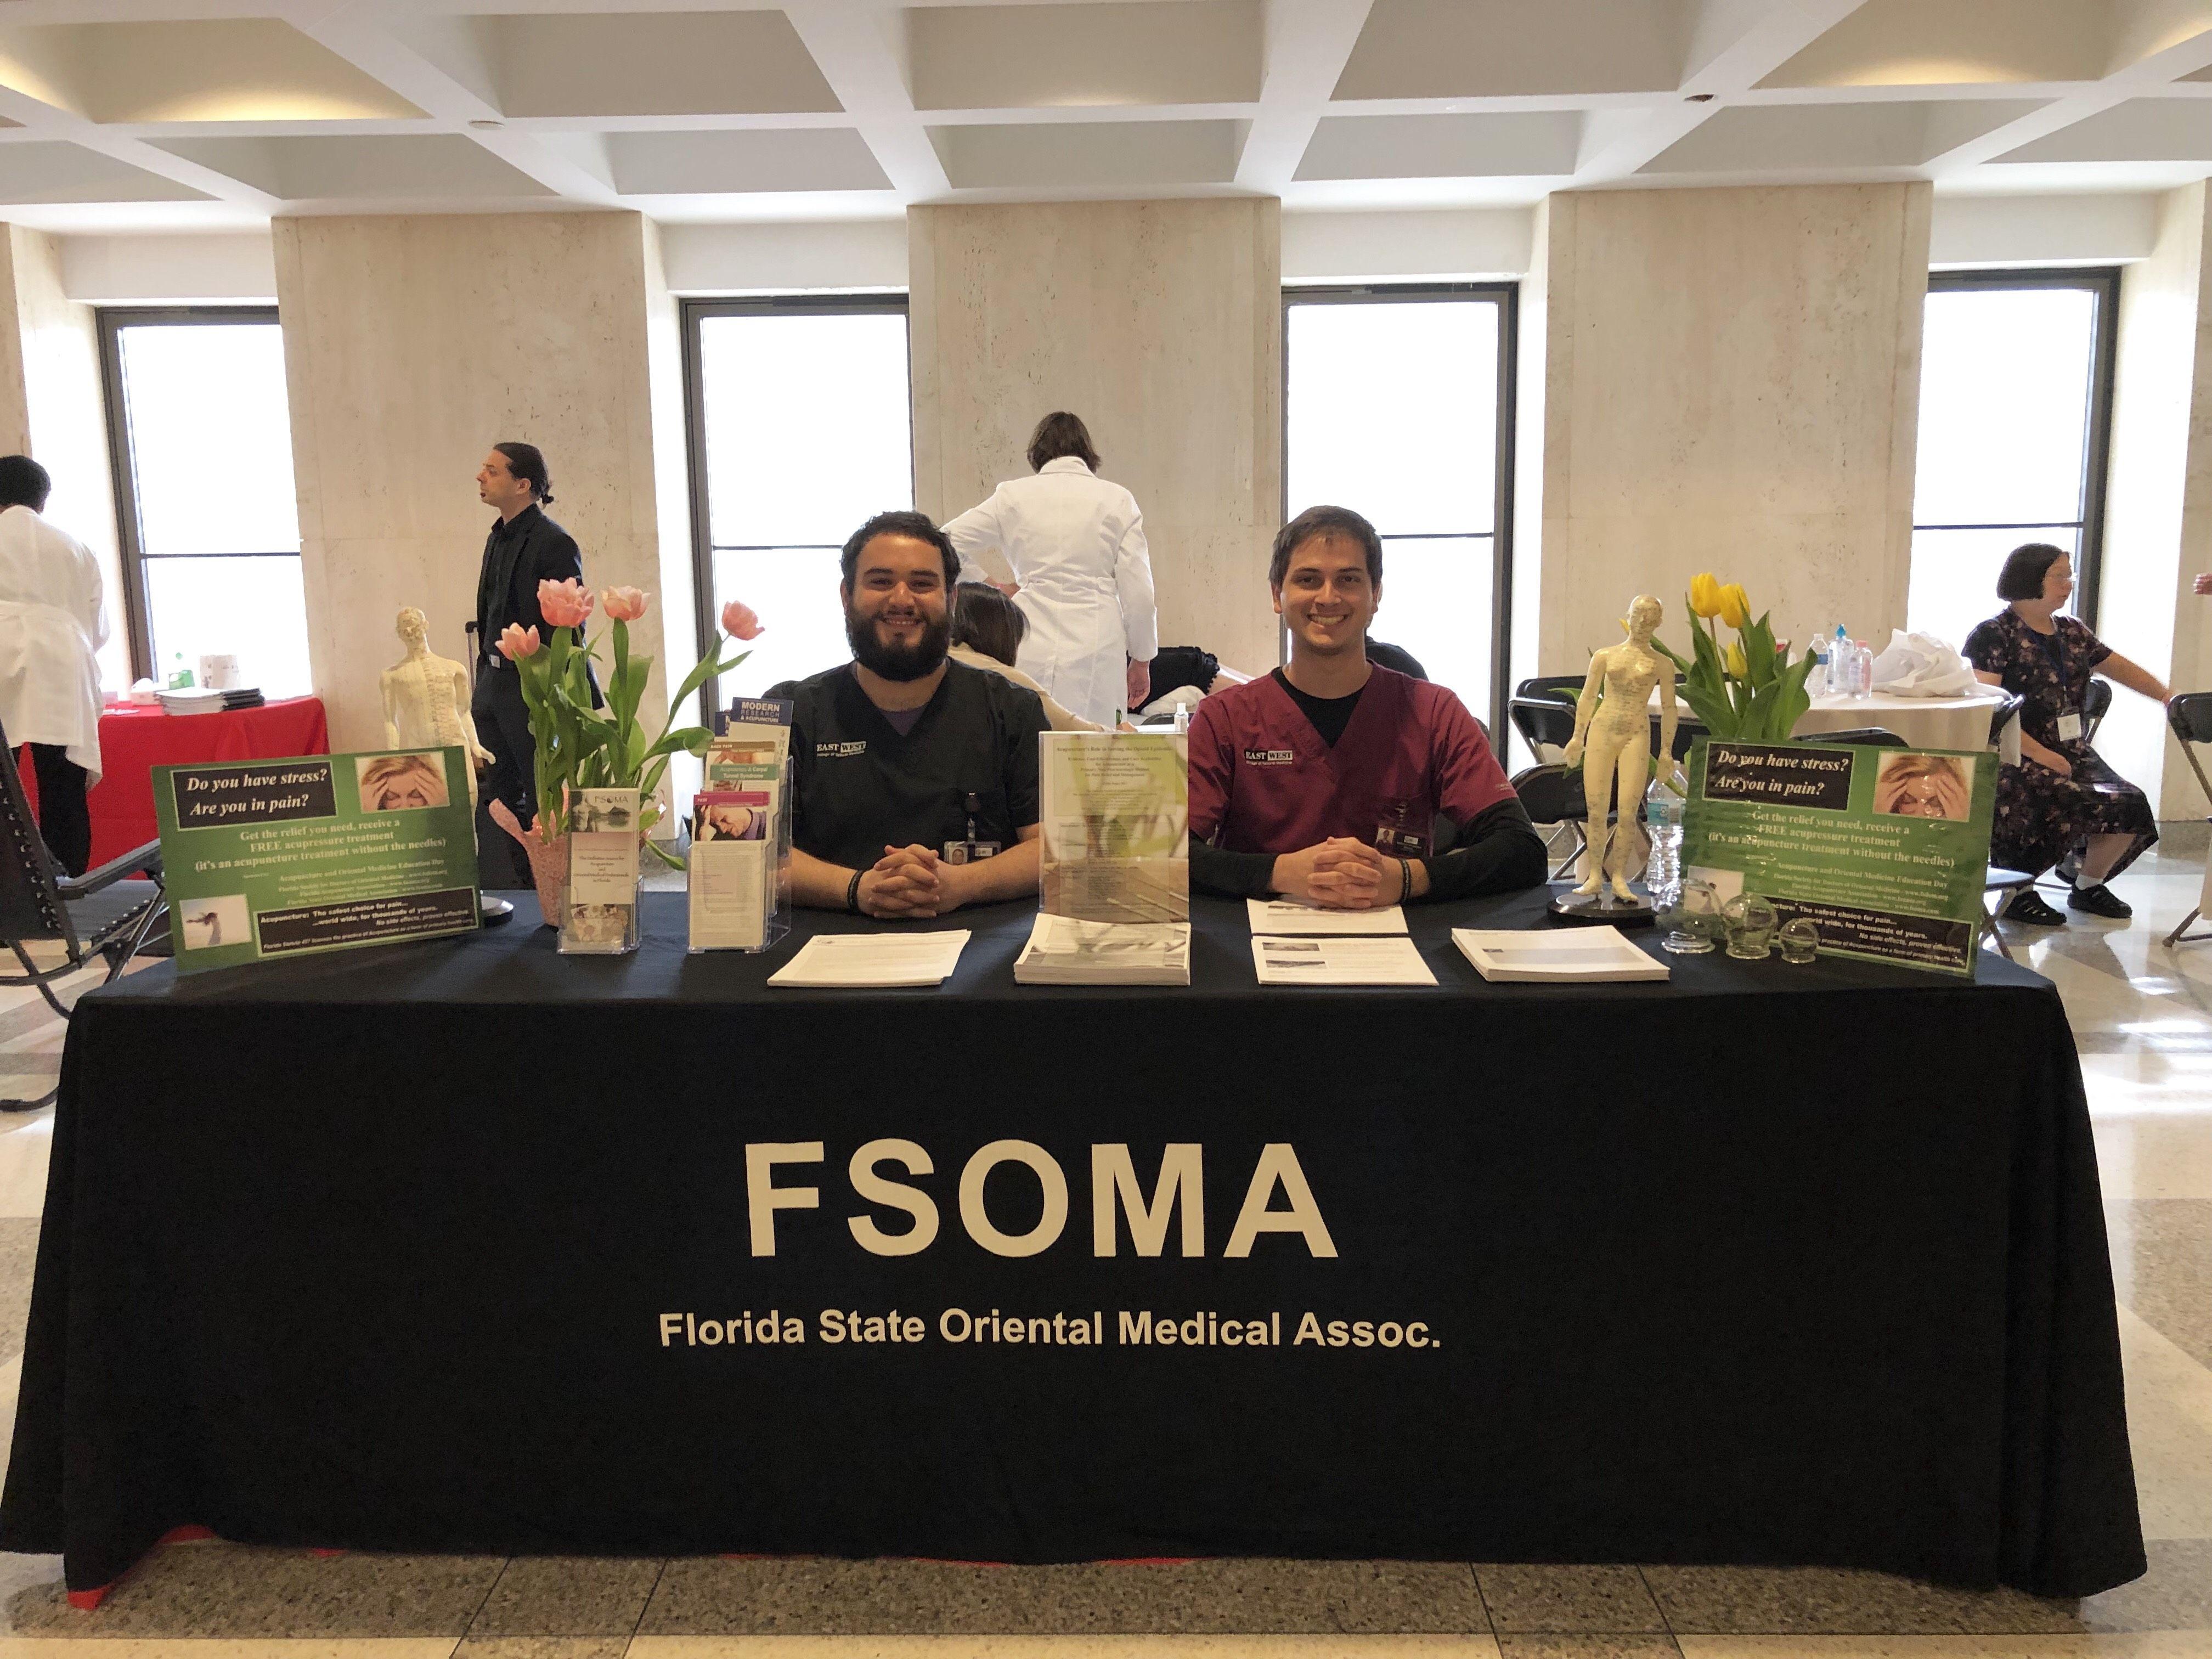 FSOMA (Florida State Oriental Medical Association